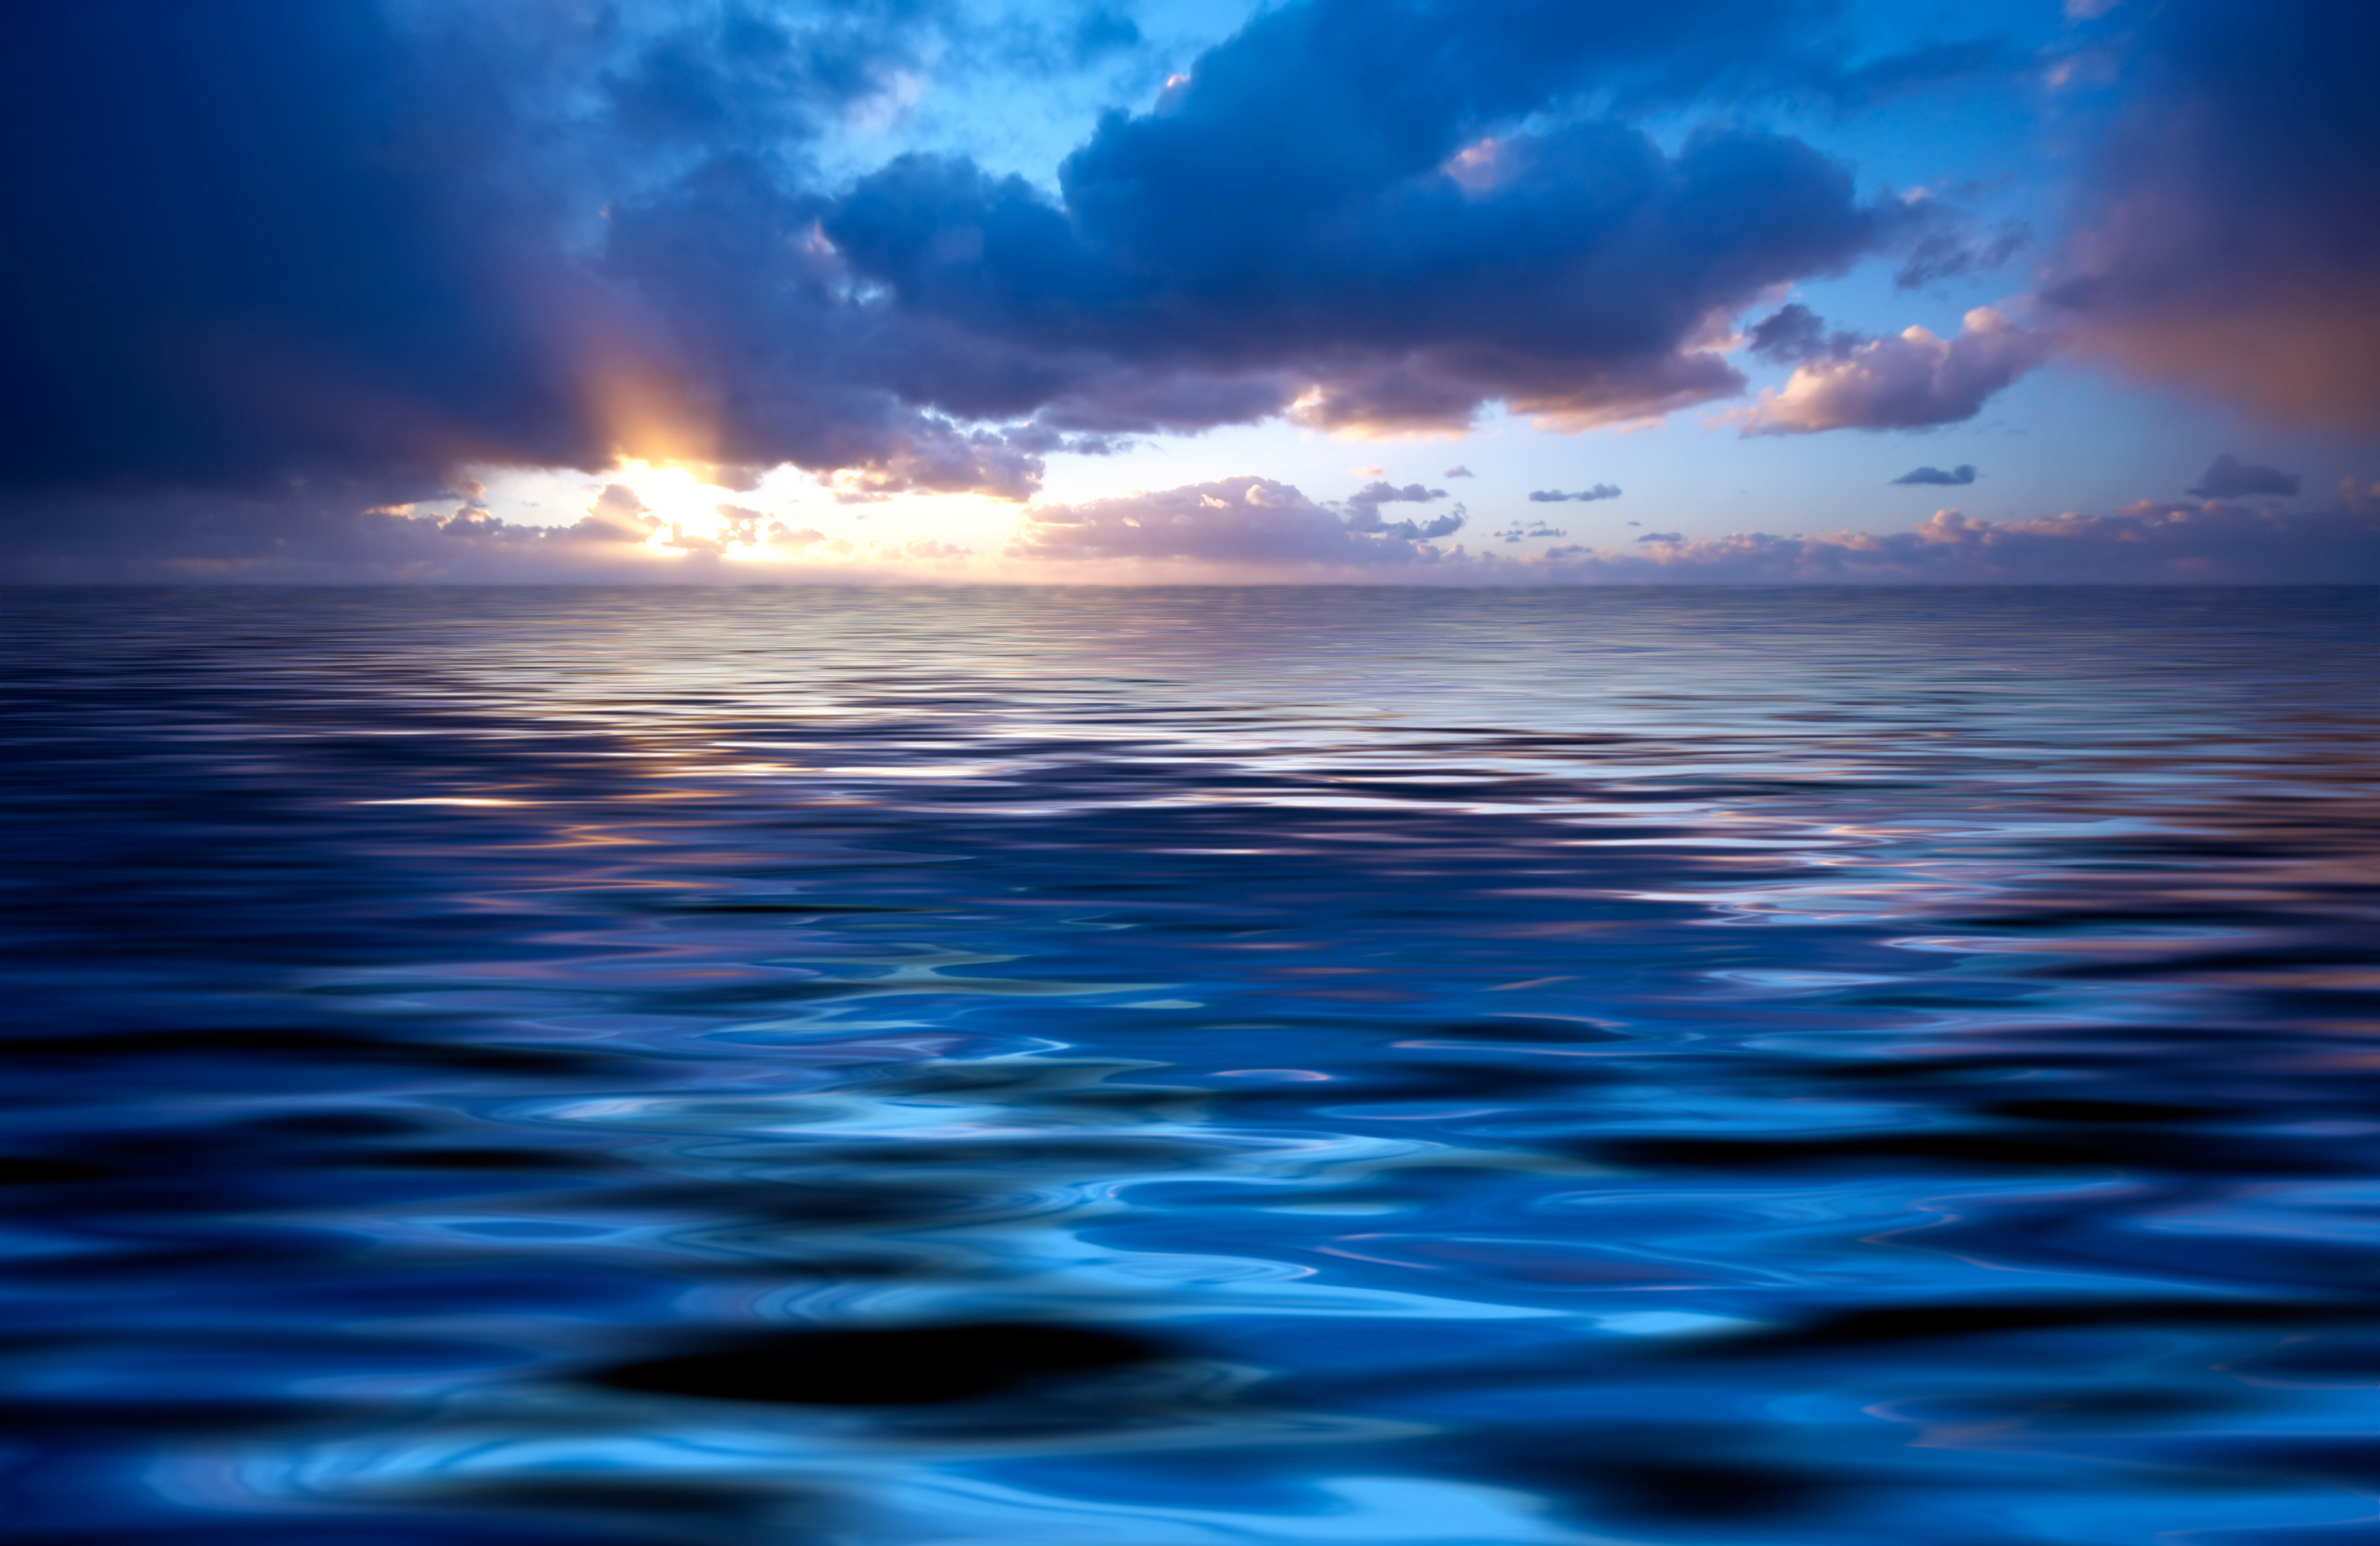 Retina Wallpaper Beach Sea Hd Desktop Wallpapers: Ocean 5k Retina Ultra HD Wallpaper And Background Image